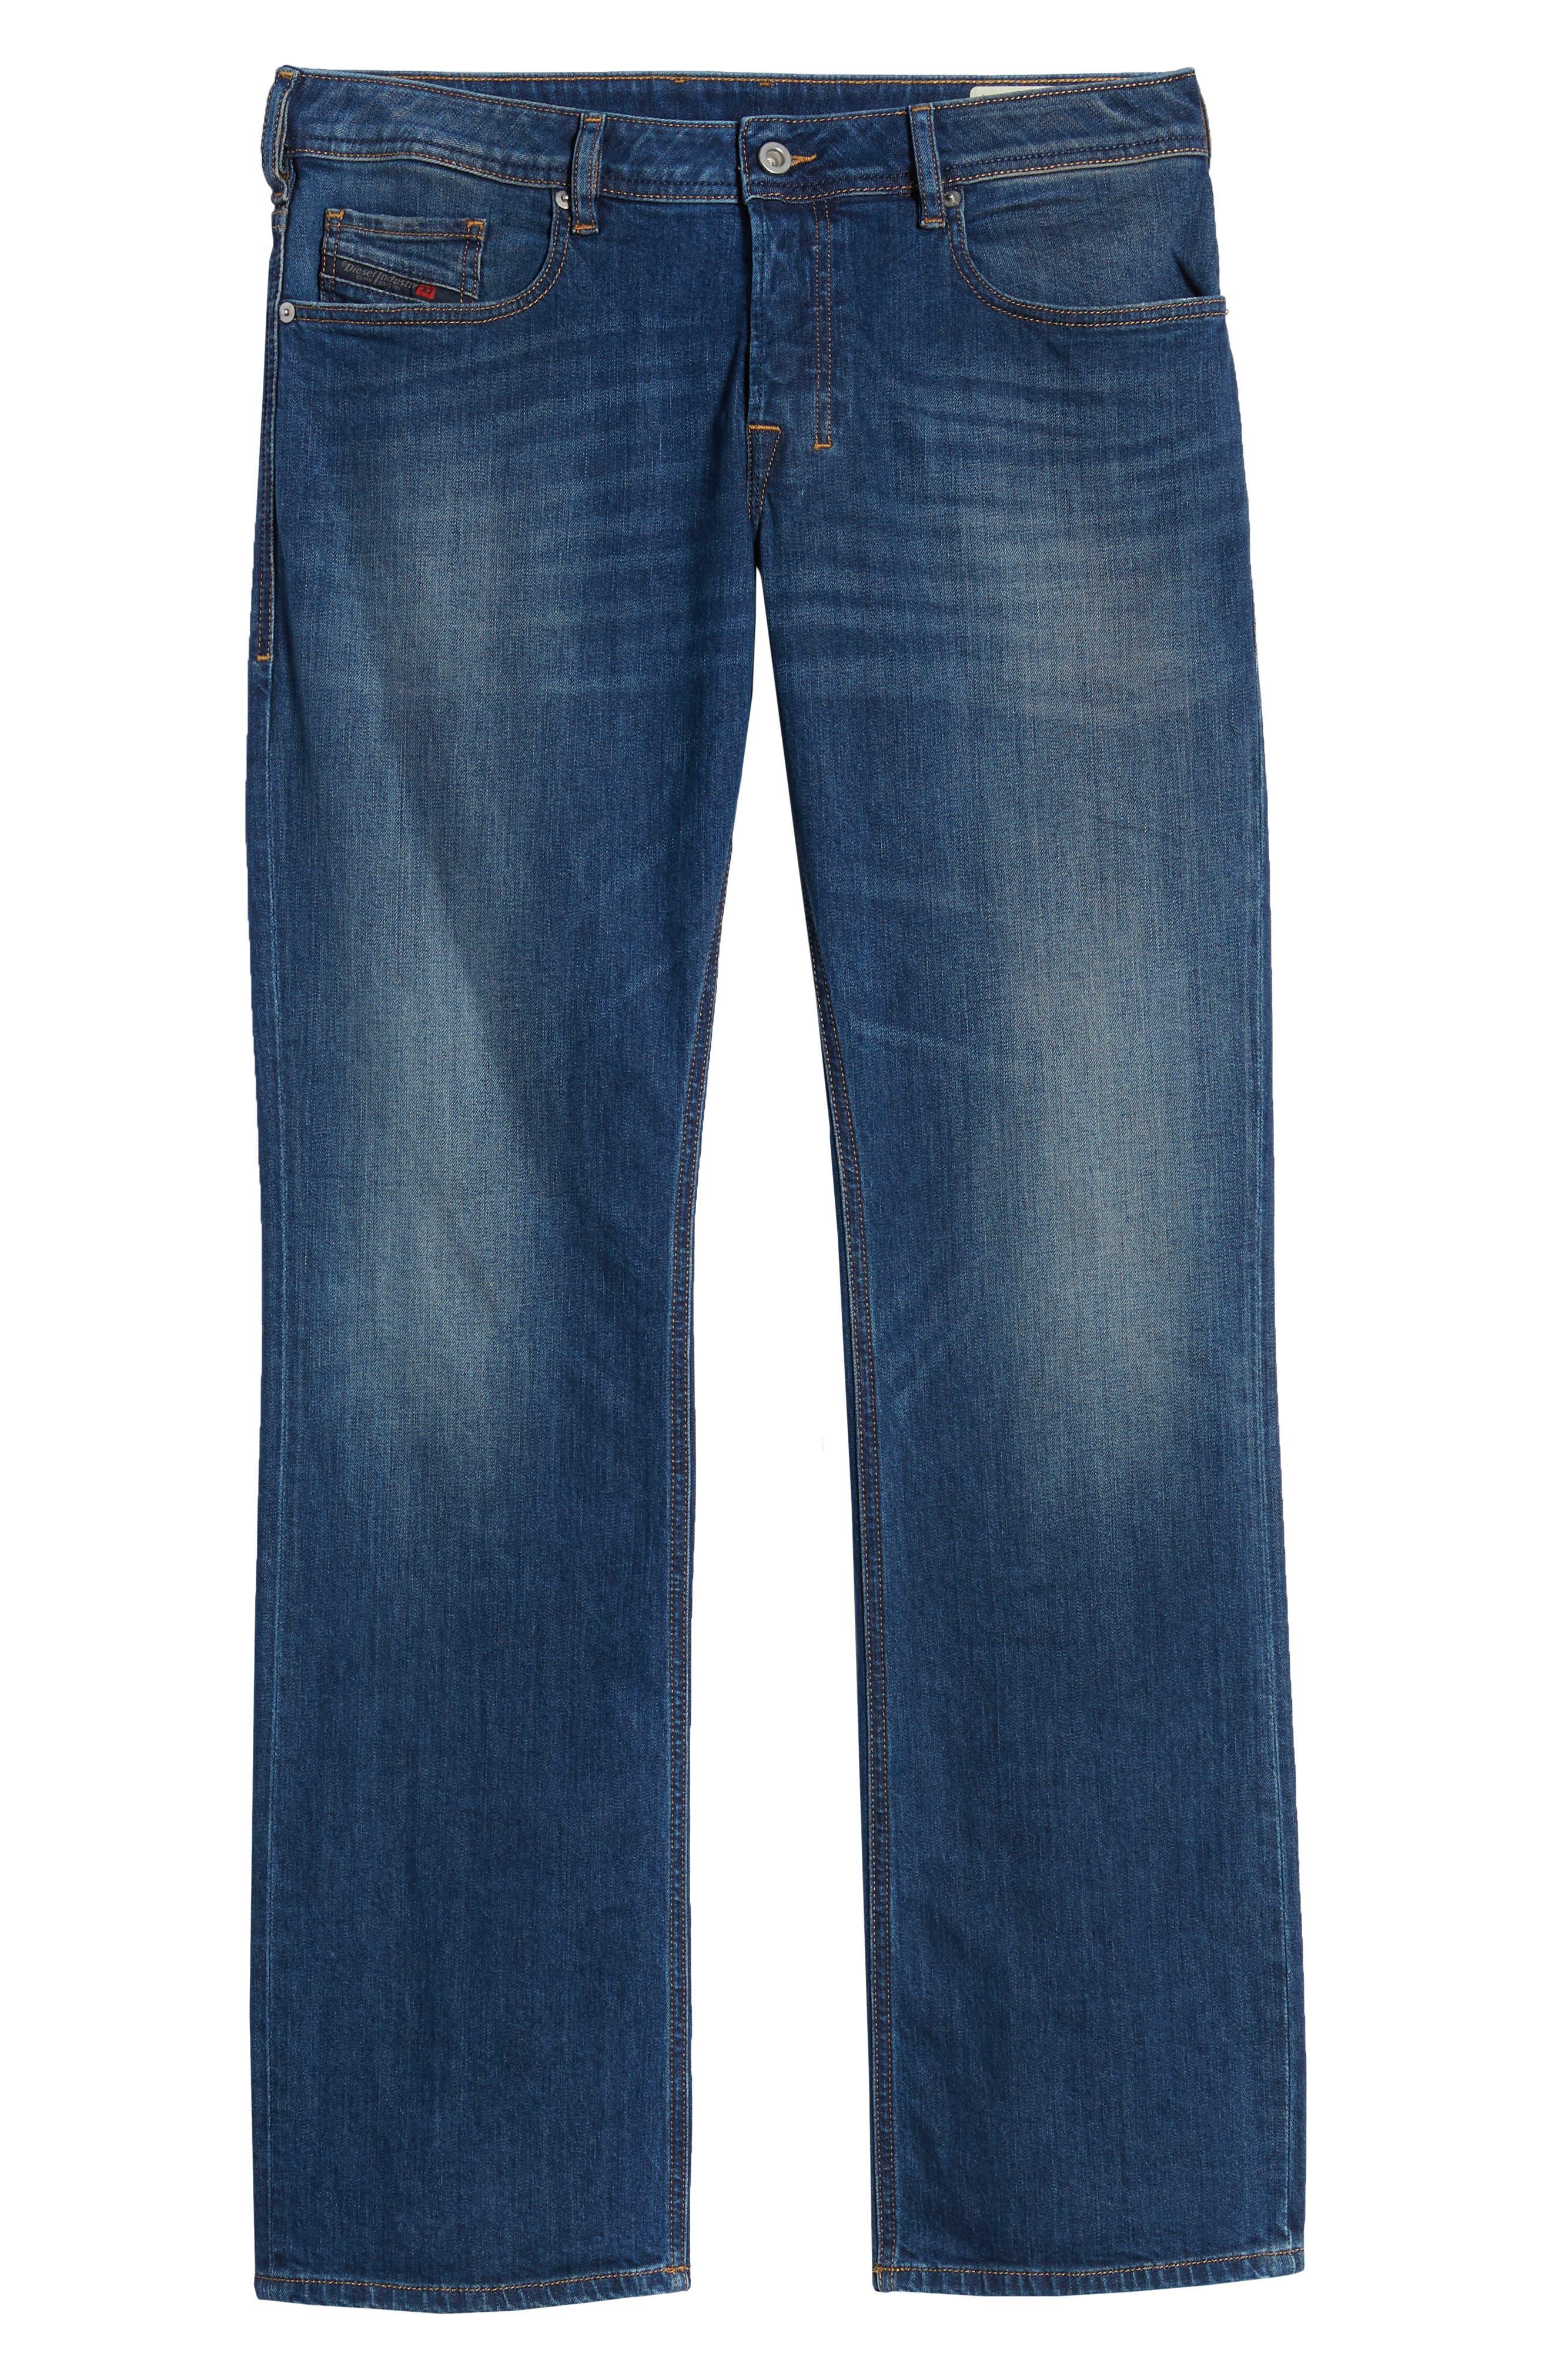 DIESEL<SUP>®</SUP>, Zatiny Bootcut Jeans, Alternate thumbnail 7, color, DENIM